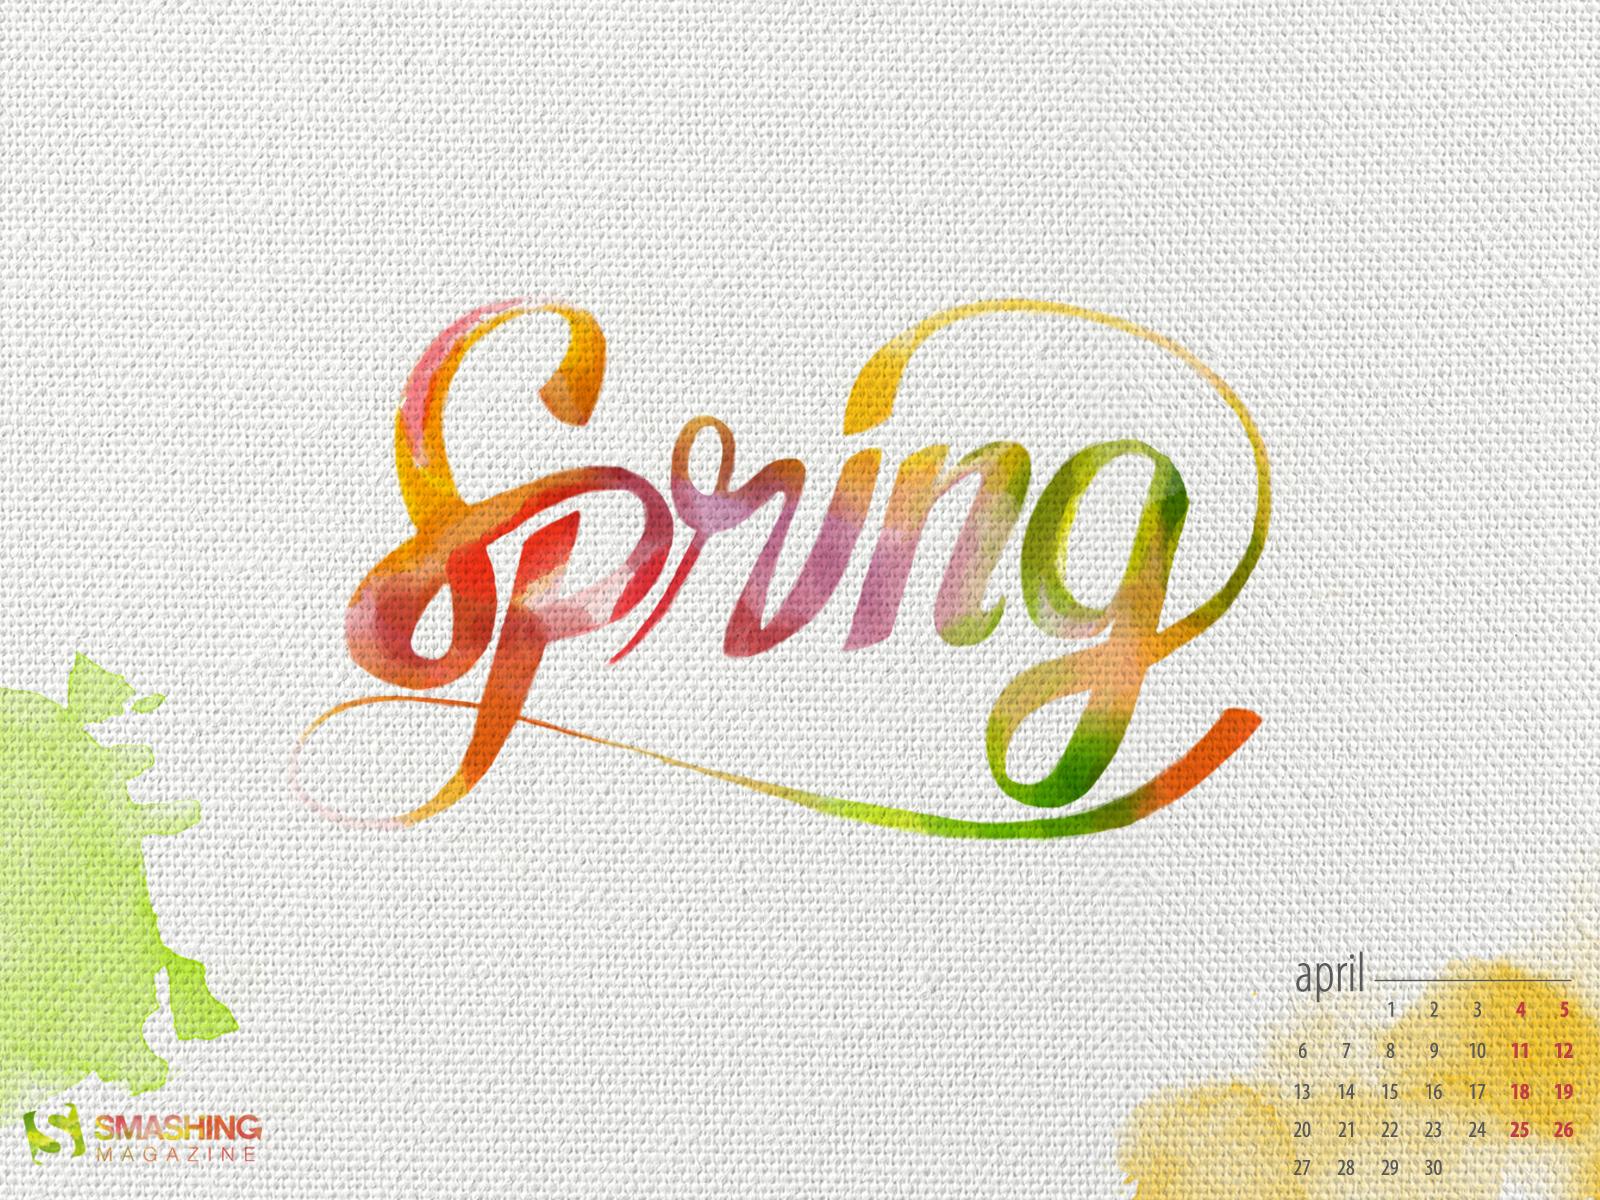 Desktop Wallpaper Calendars April 2015 Smashing Magazine 1600x1200